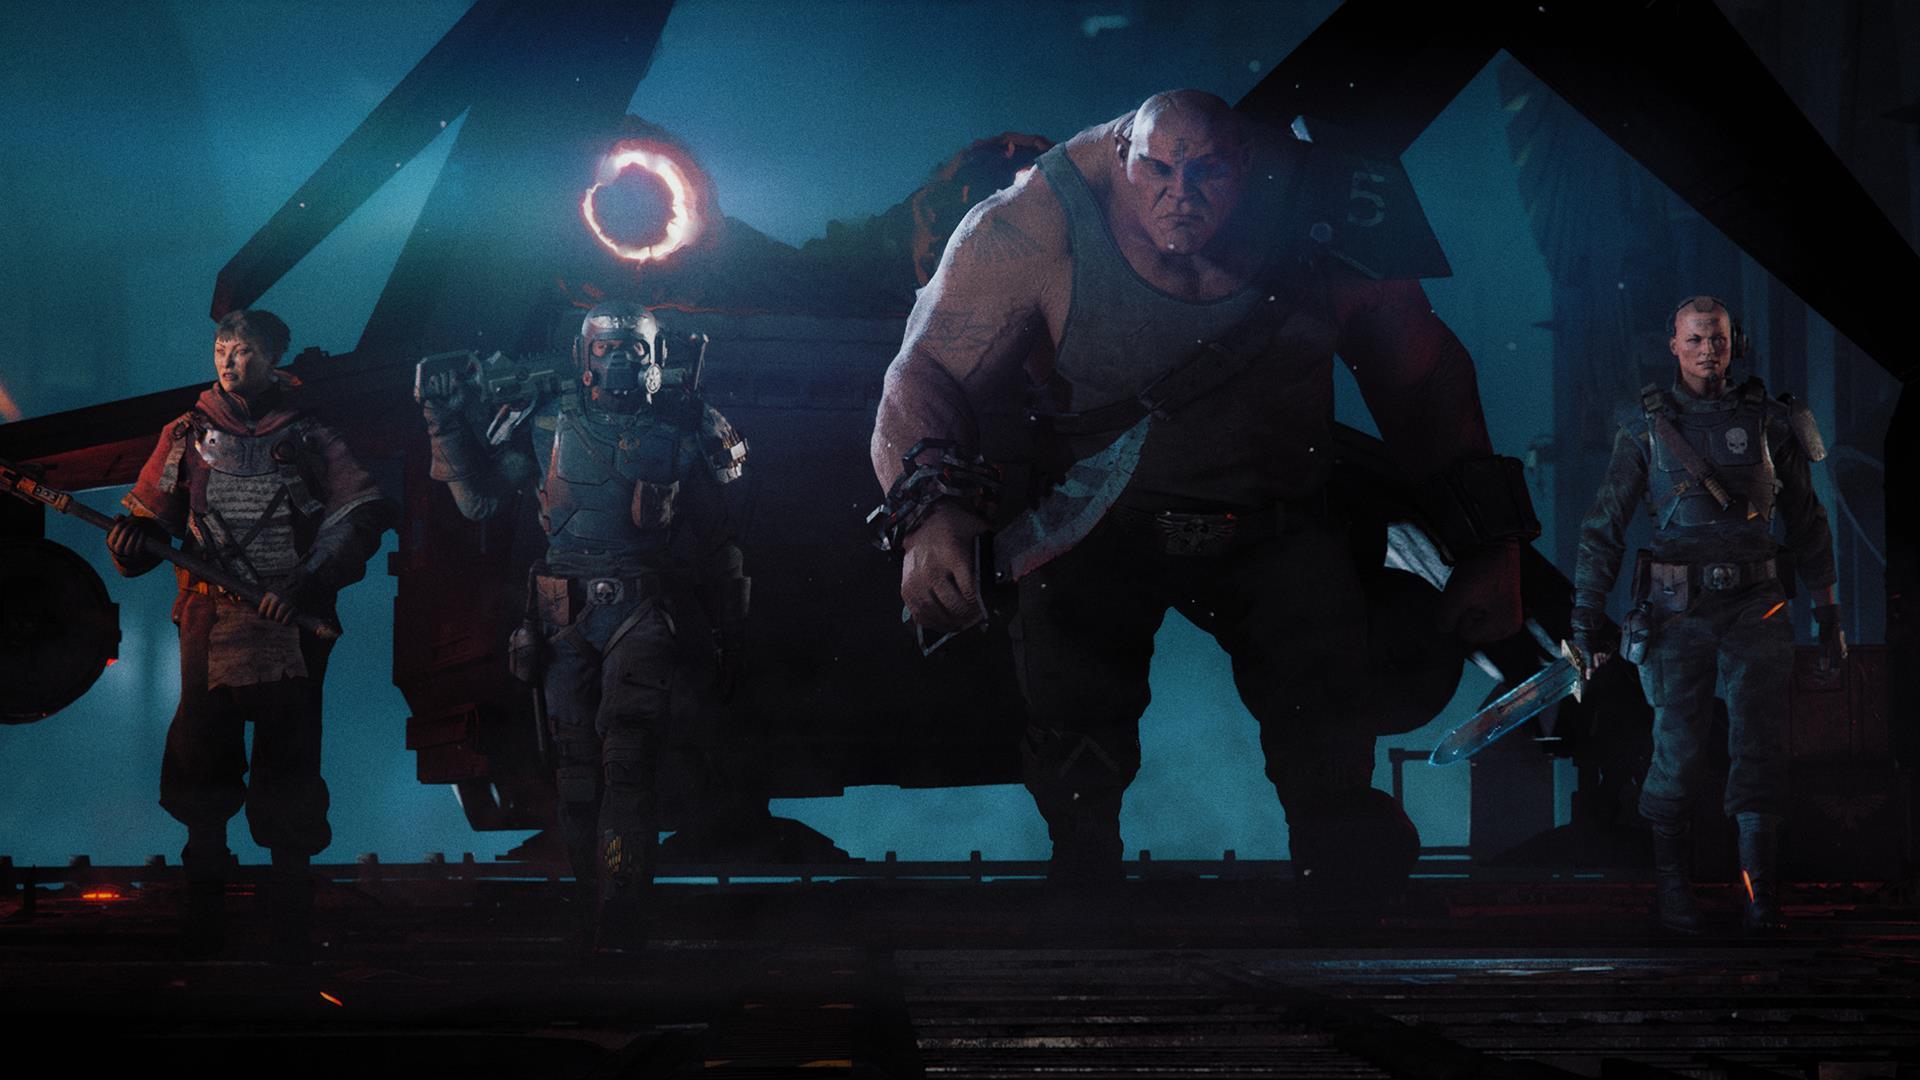 Image for Warhammer 40,000: Darktide delayed to spring 2022